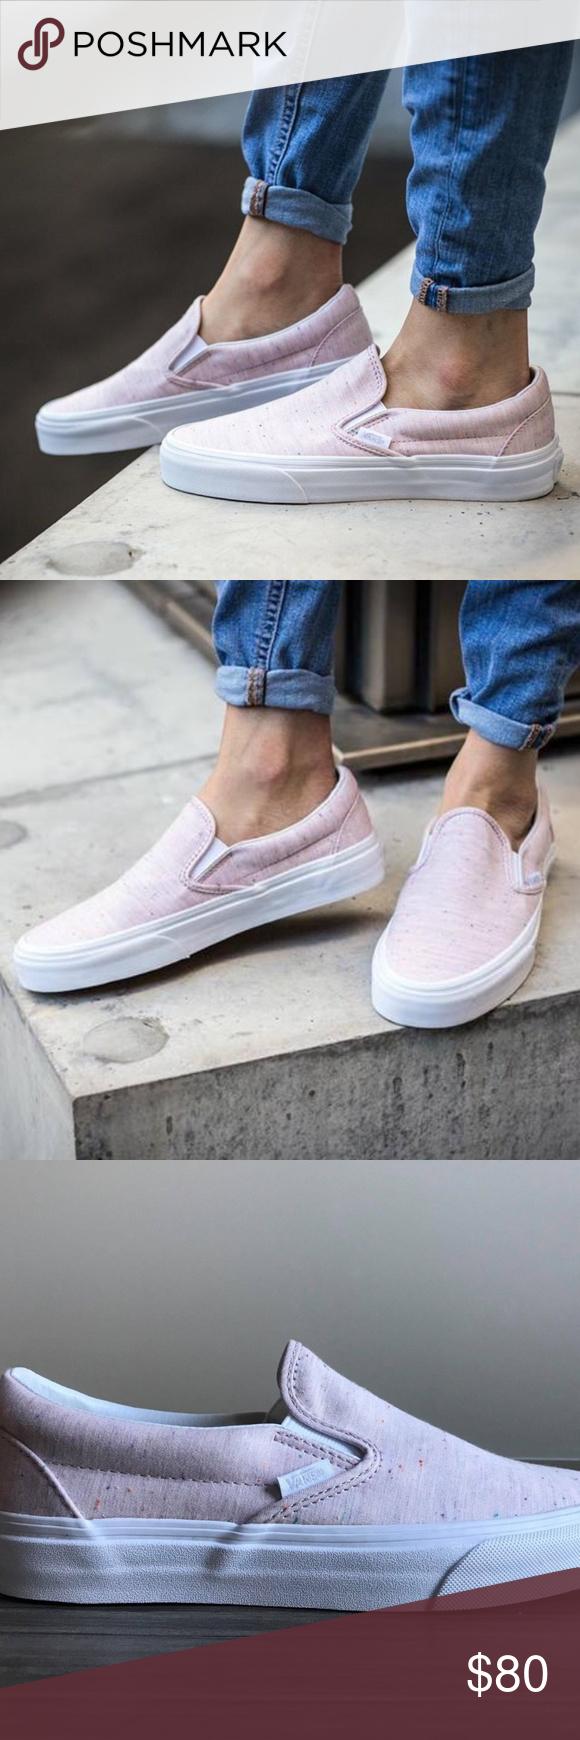 Vans Classic Slip-On Shoe Speckle